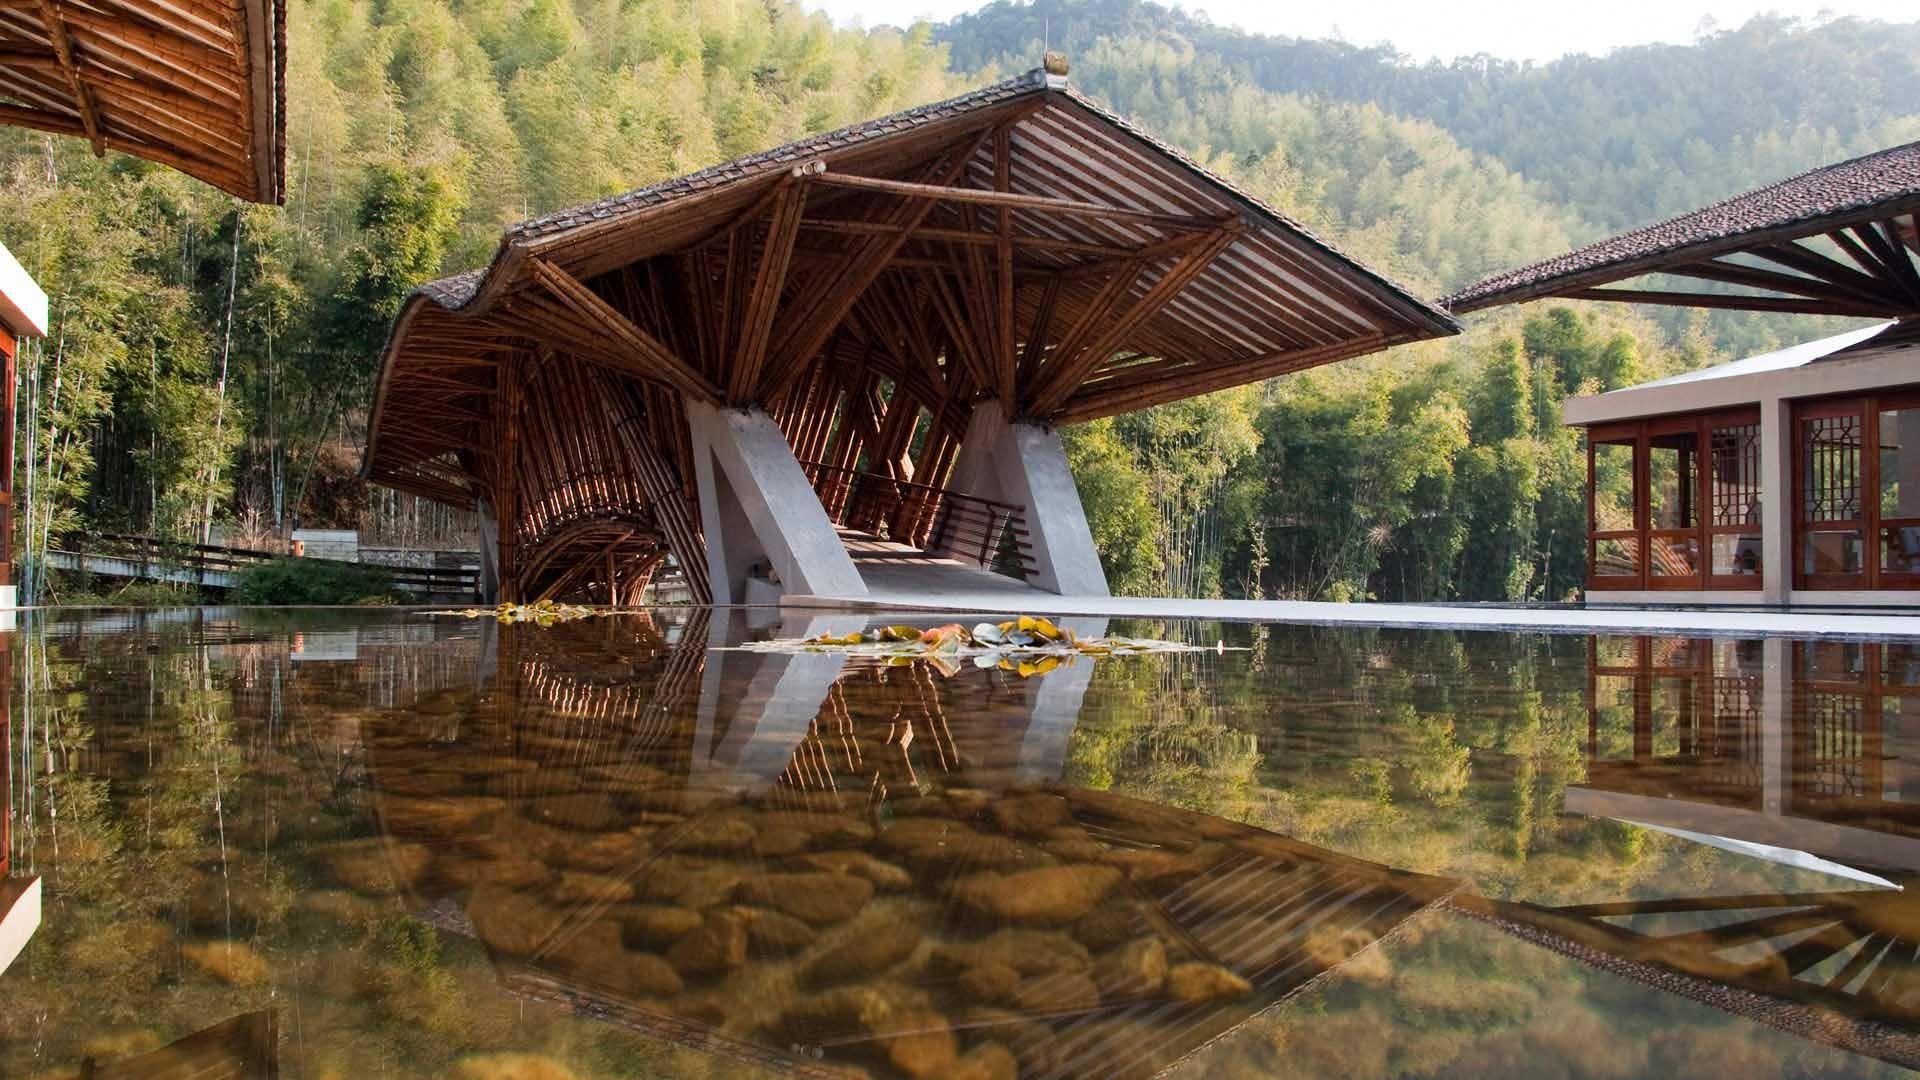 Crosswaters Eco Lodge Spa Nankunshan National Forest Park near Guangzhou China Colombian bamboo designer Simn Vlez Hostel proyect